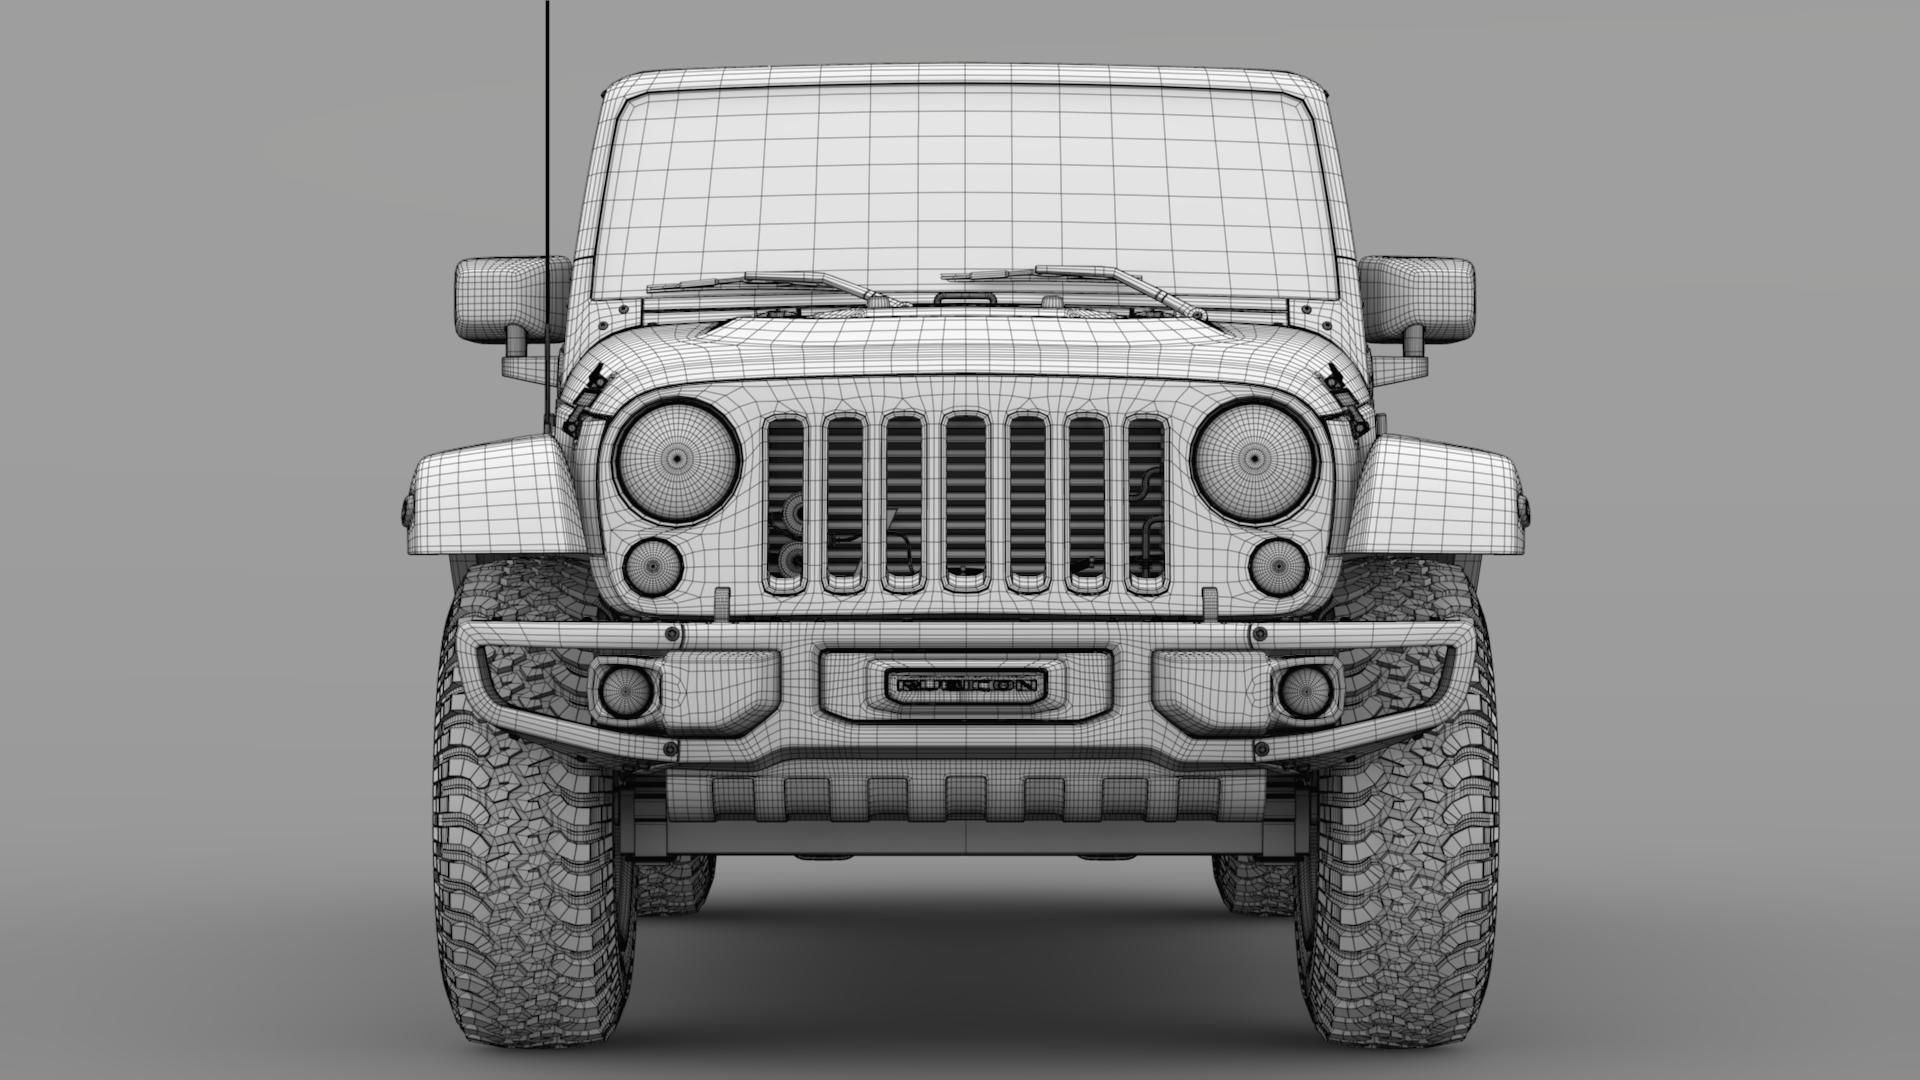 jeep wrangler unlimited rubicon recon jk 2017 3d model max fbx c4d lwo ma mb hrc xsi obj 277010